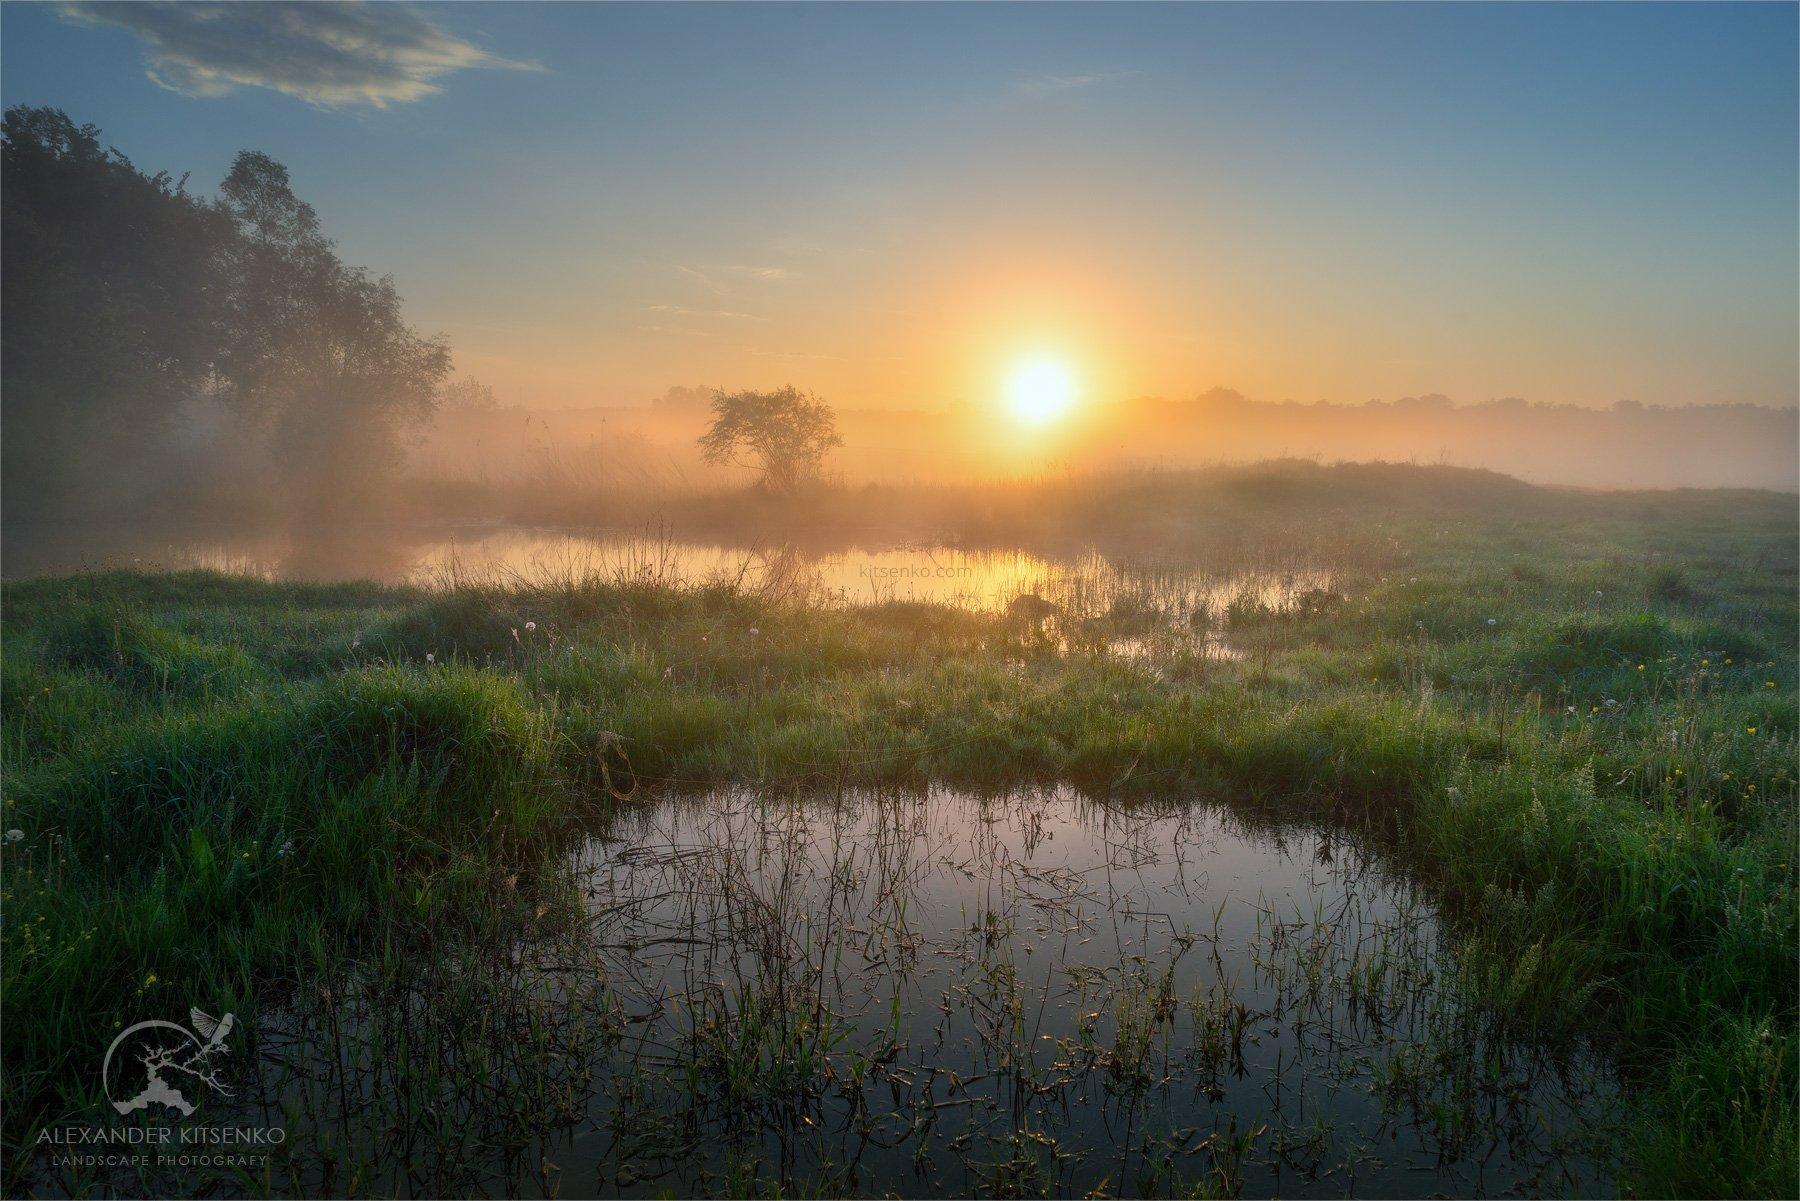 утро, луг, весна, солнце, рассвет, туман, Александр Киценко